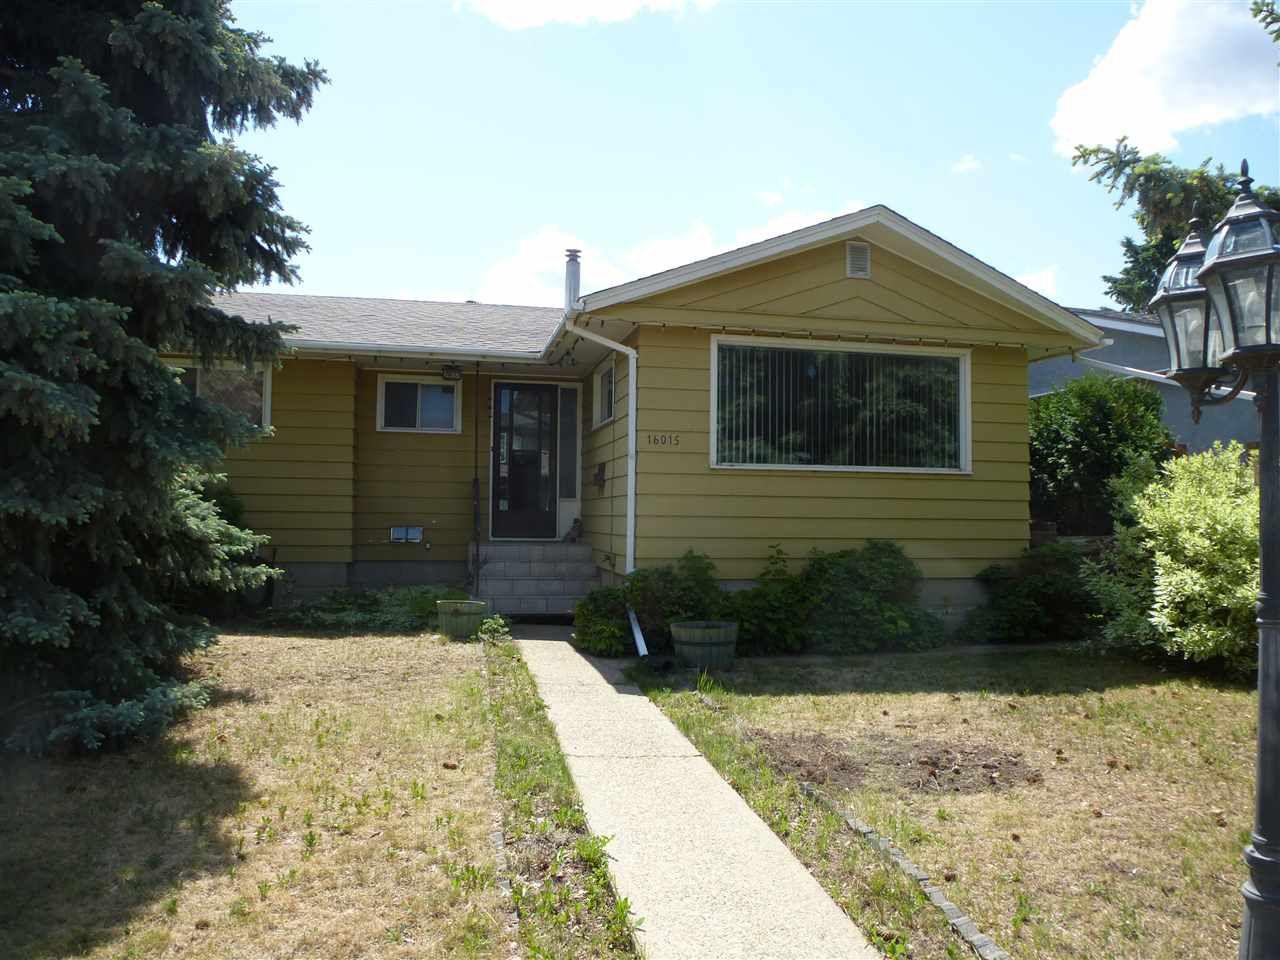 Main Photo: 16015 103 Avenue in Edmonton: Zone 21 House for sale : MLS®# E4164883